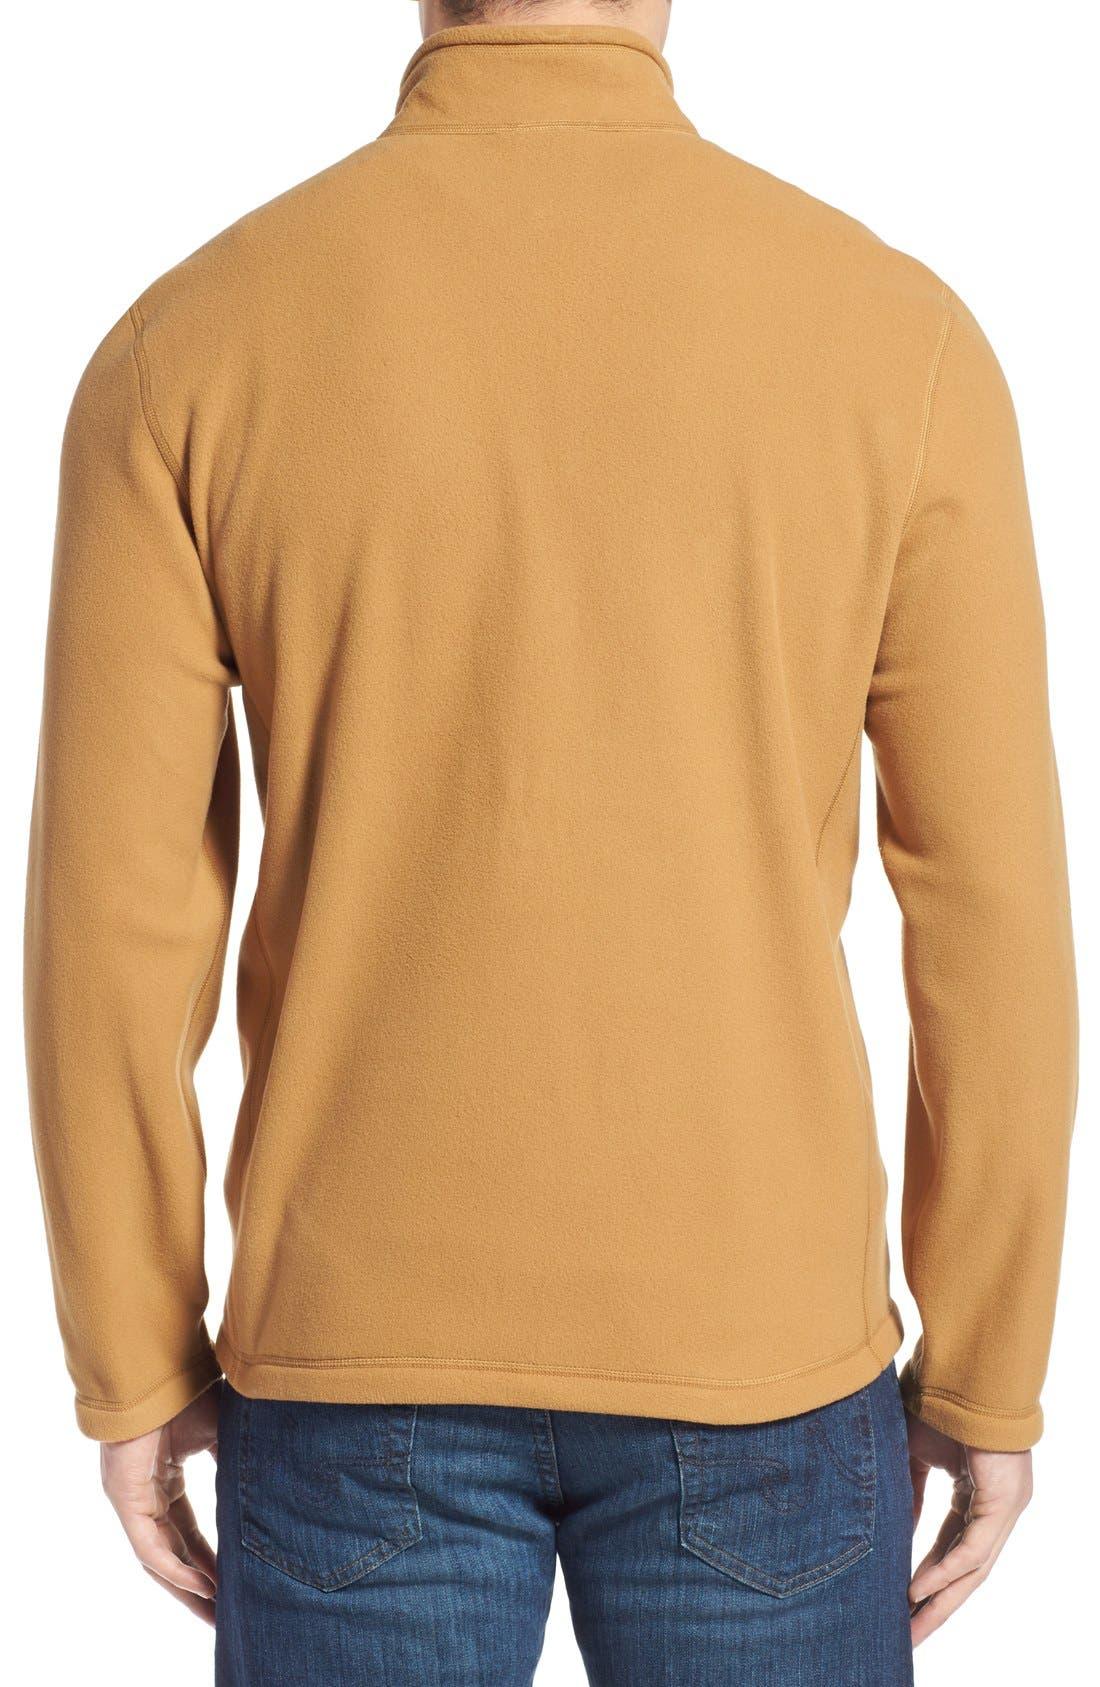 'TKA 100 Glacier' Quarter Zip Fleece Pullover,                             Alternate thumbnail 71, color,